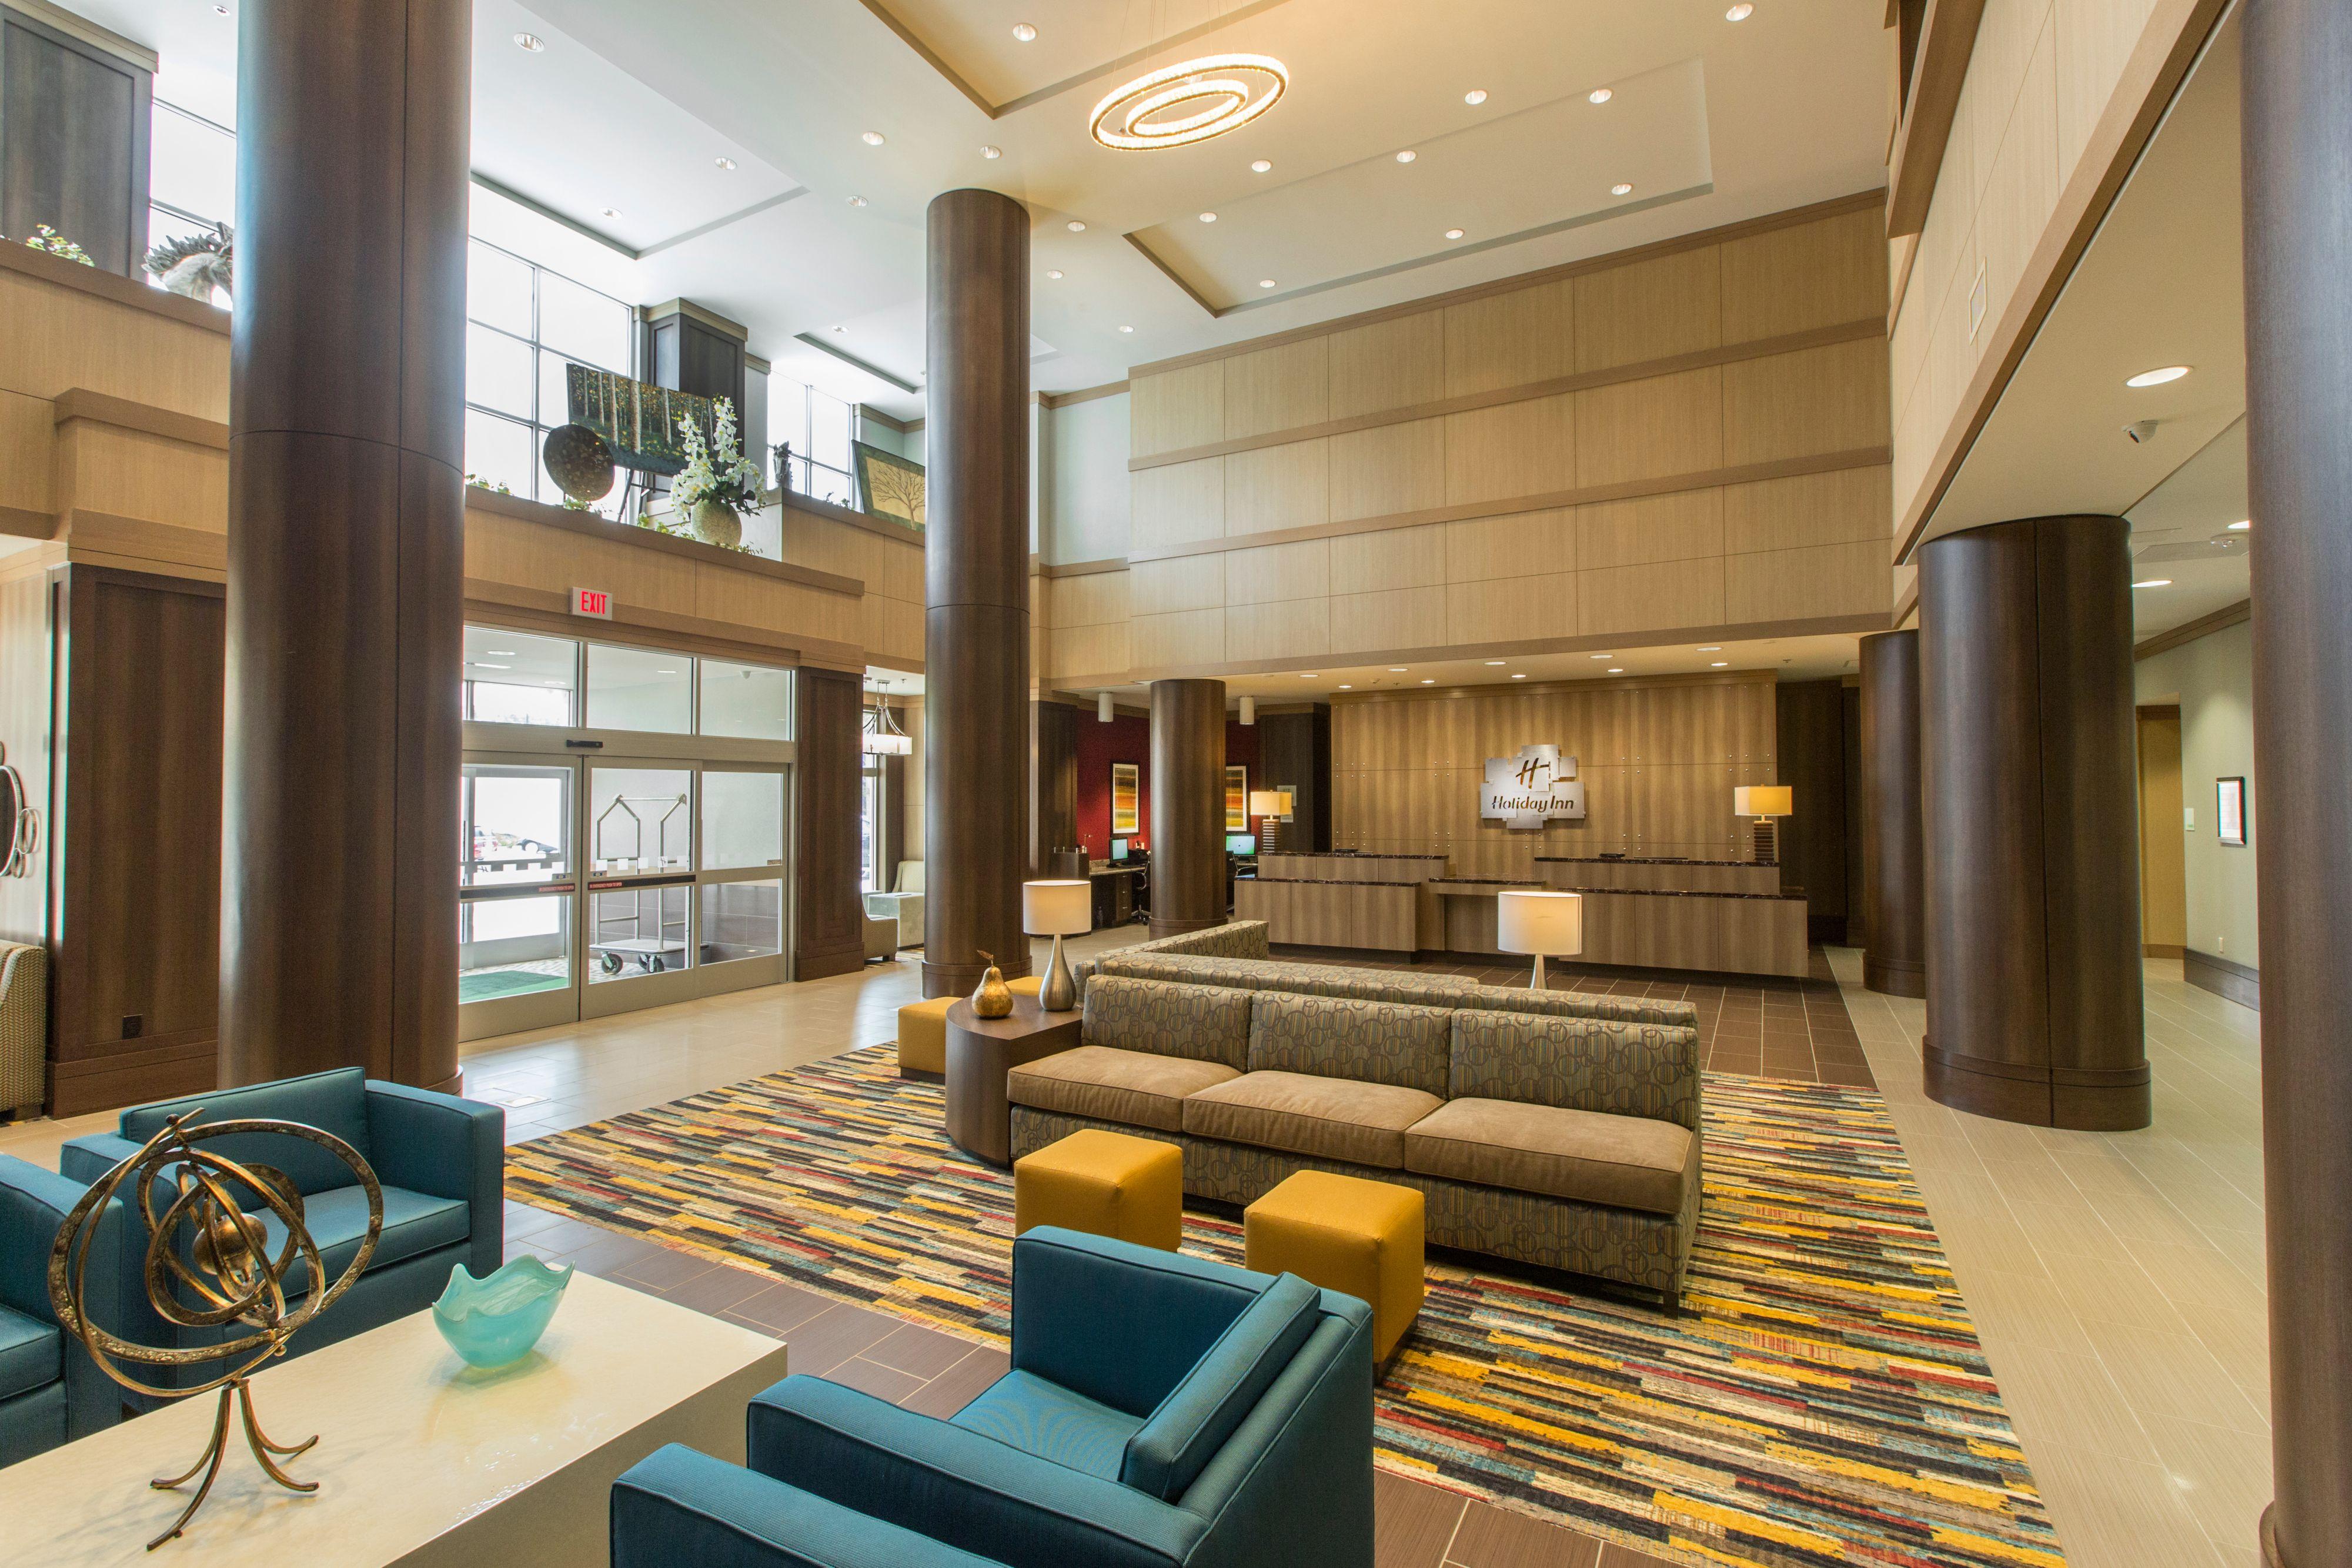 Holiday Inn Hotel And Suites Shenandoah The Woodlands Shenandoah Tx